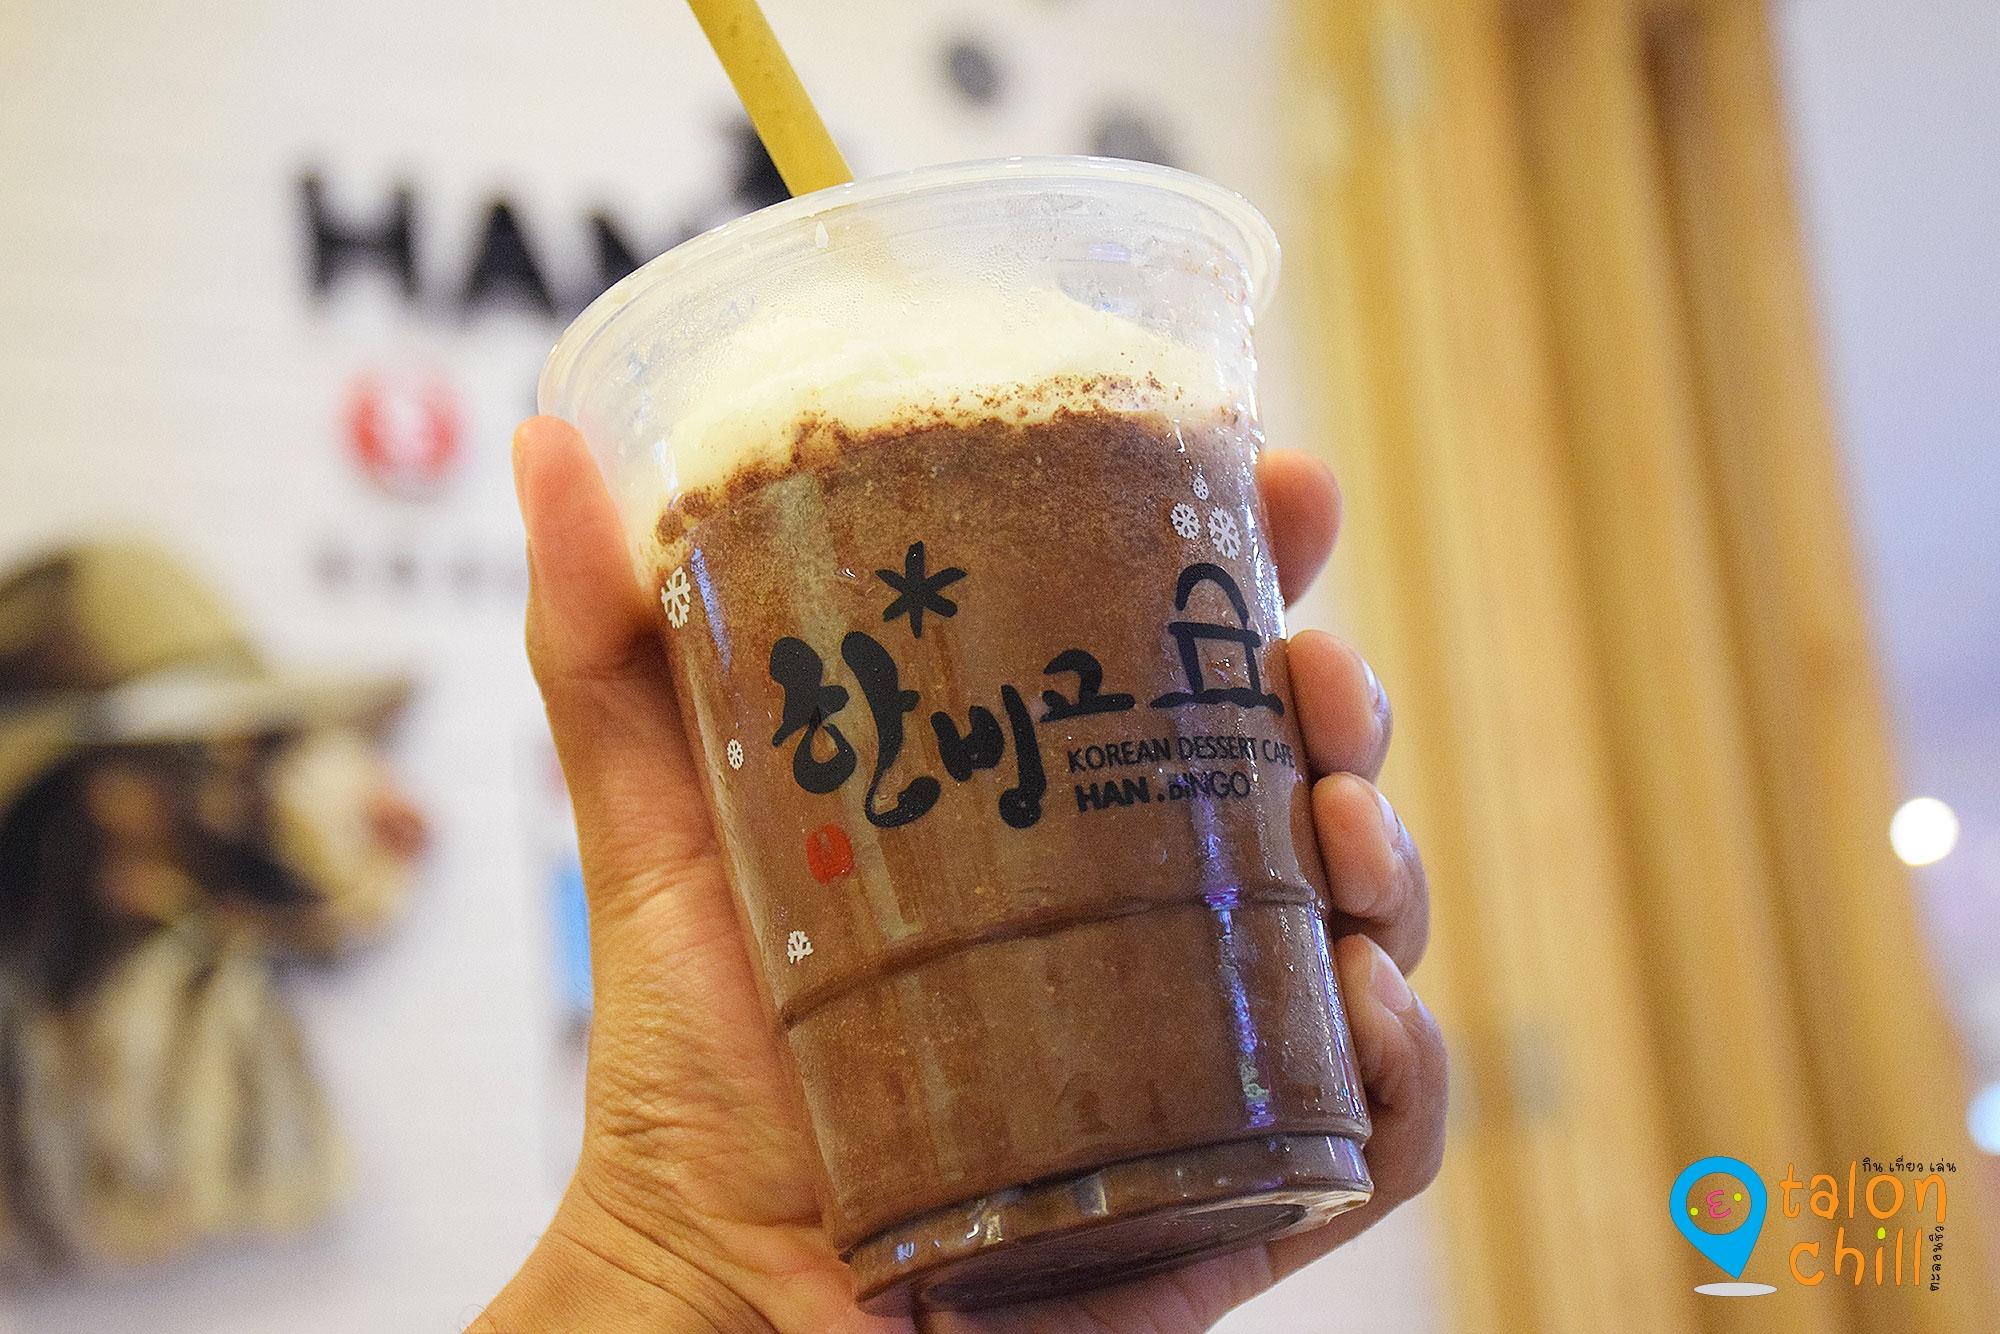 [Review] น้ำแข็งใสเกาหลี (บิงซู) ร้าน Hanbingo สาขาตึกเบลล์ พระราม 9